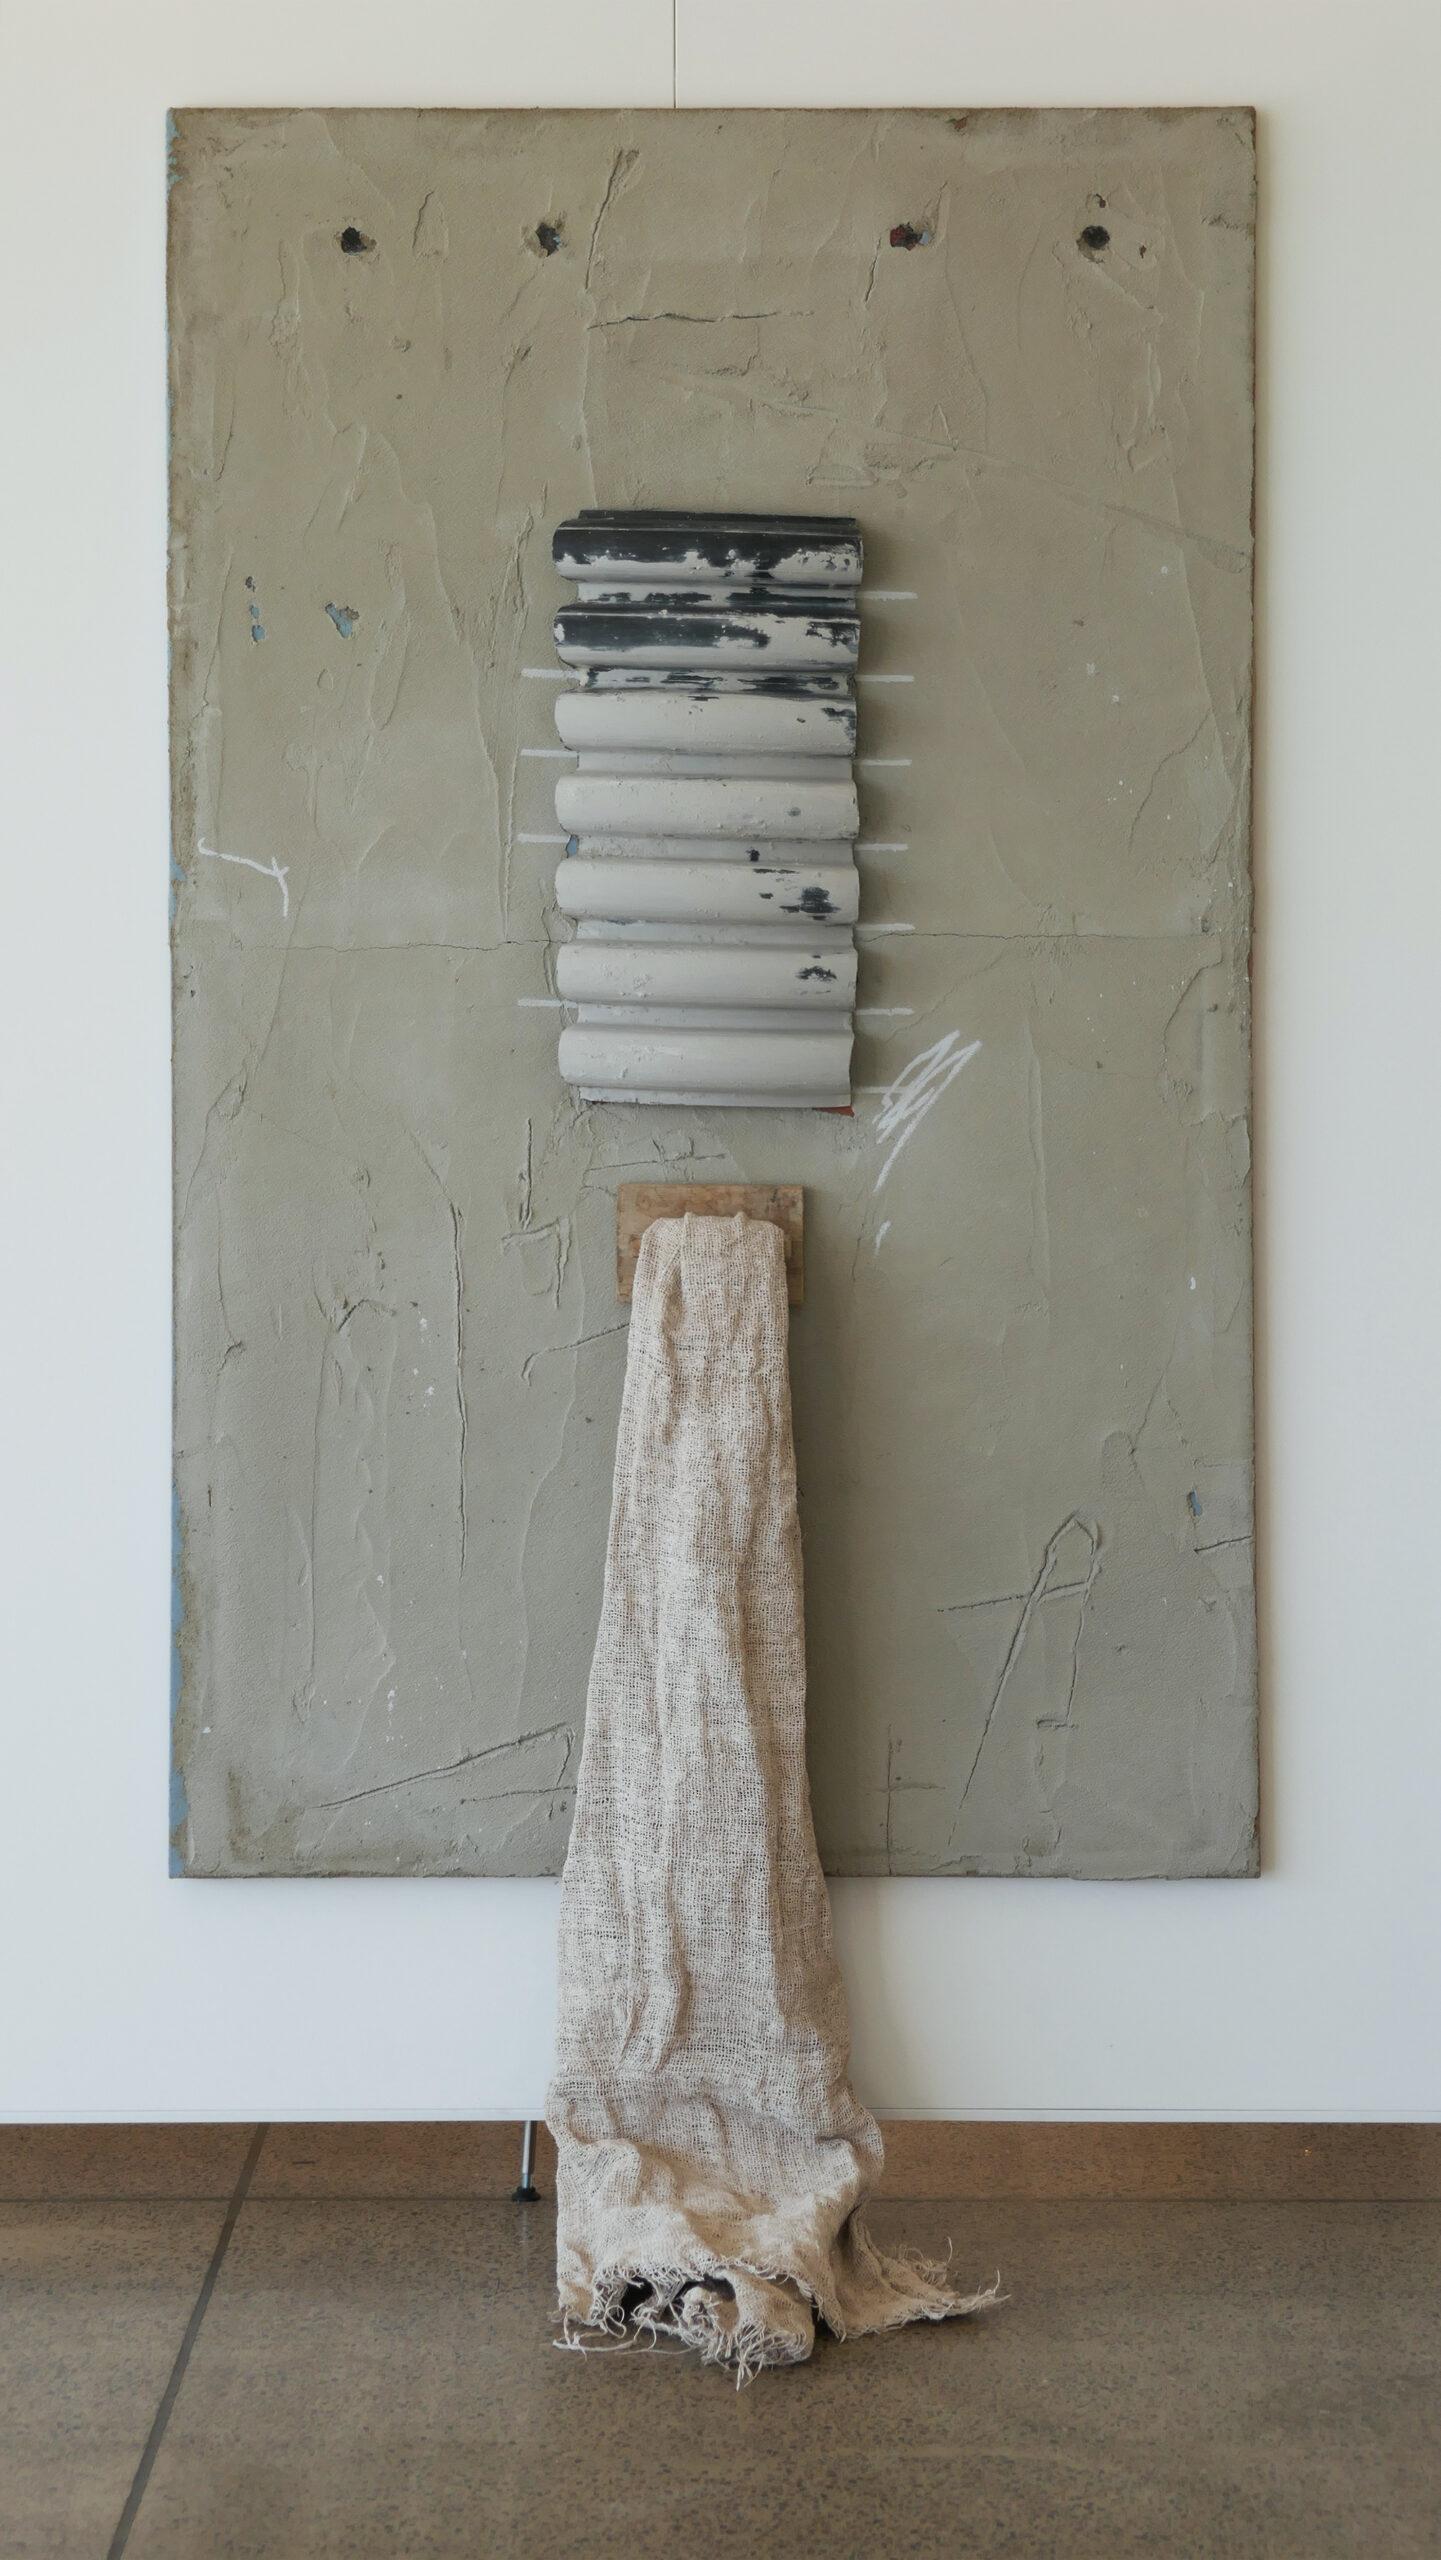 Дайнюс Трумпис, инсталляция